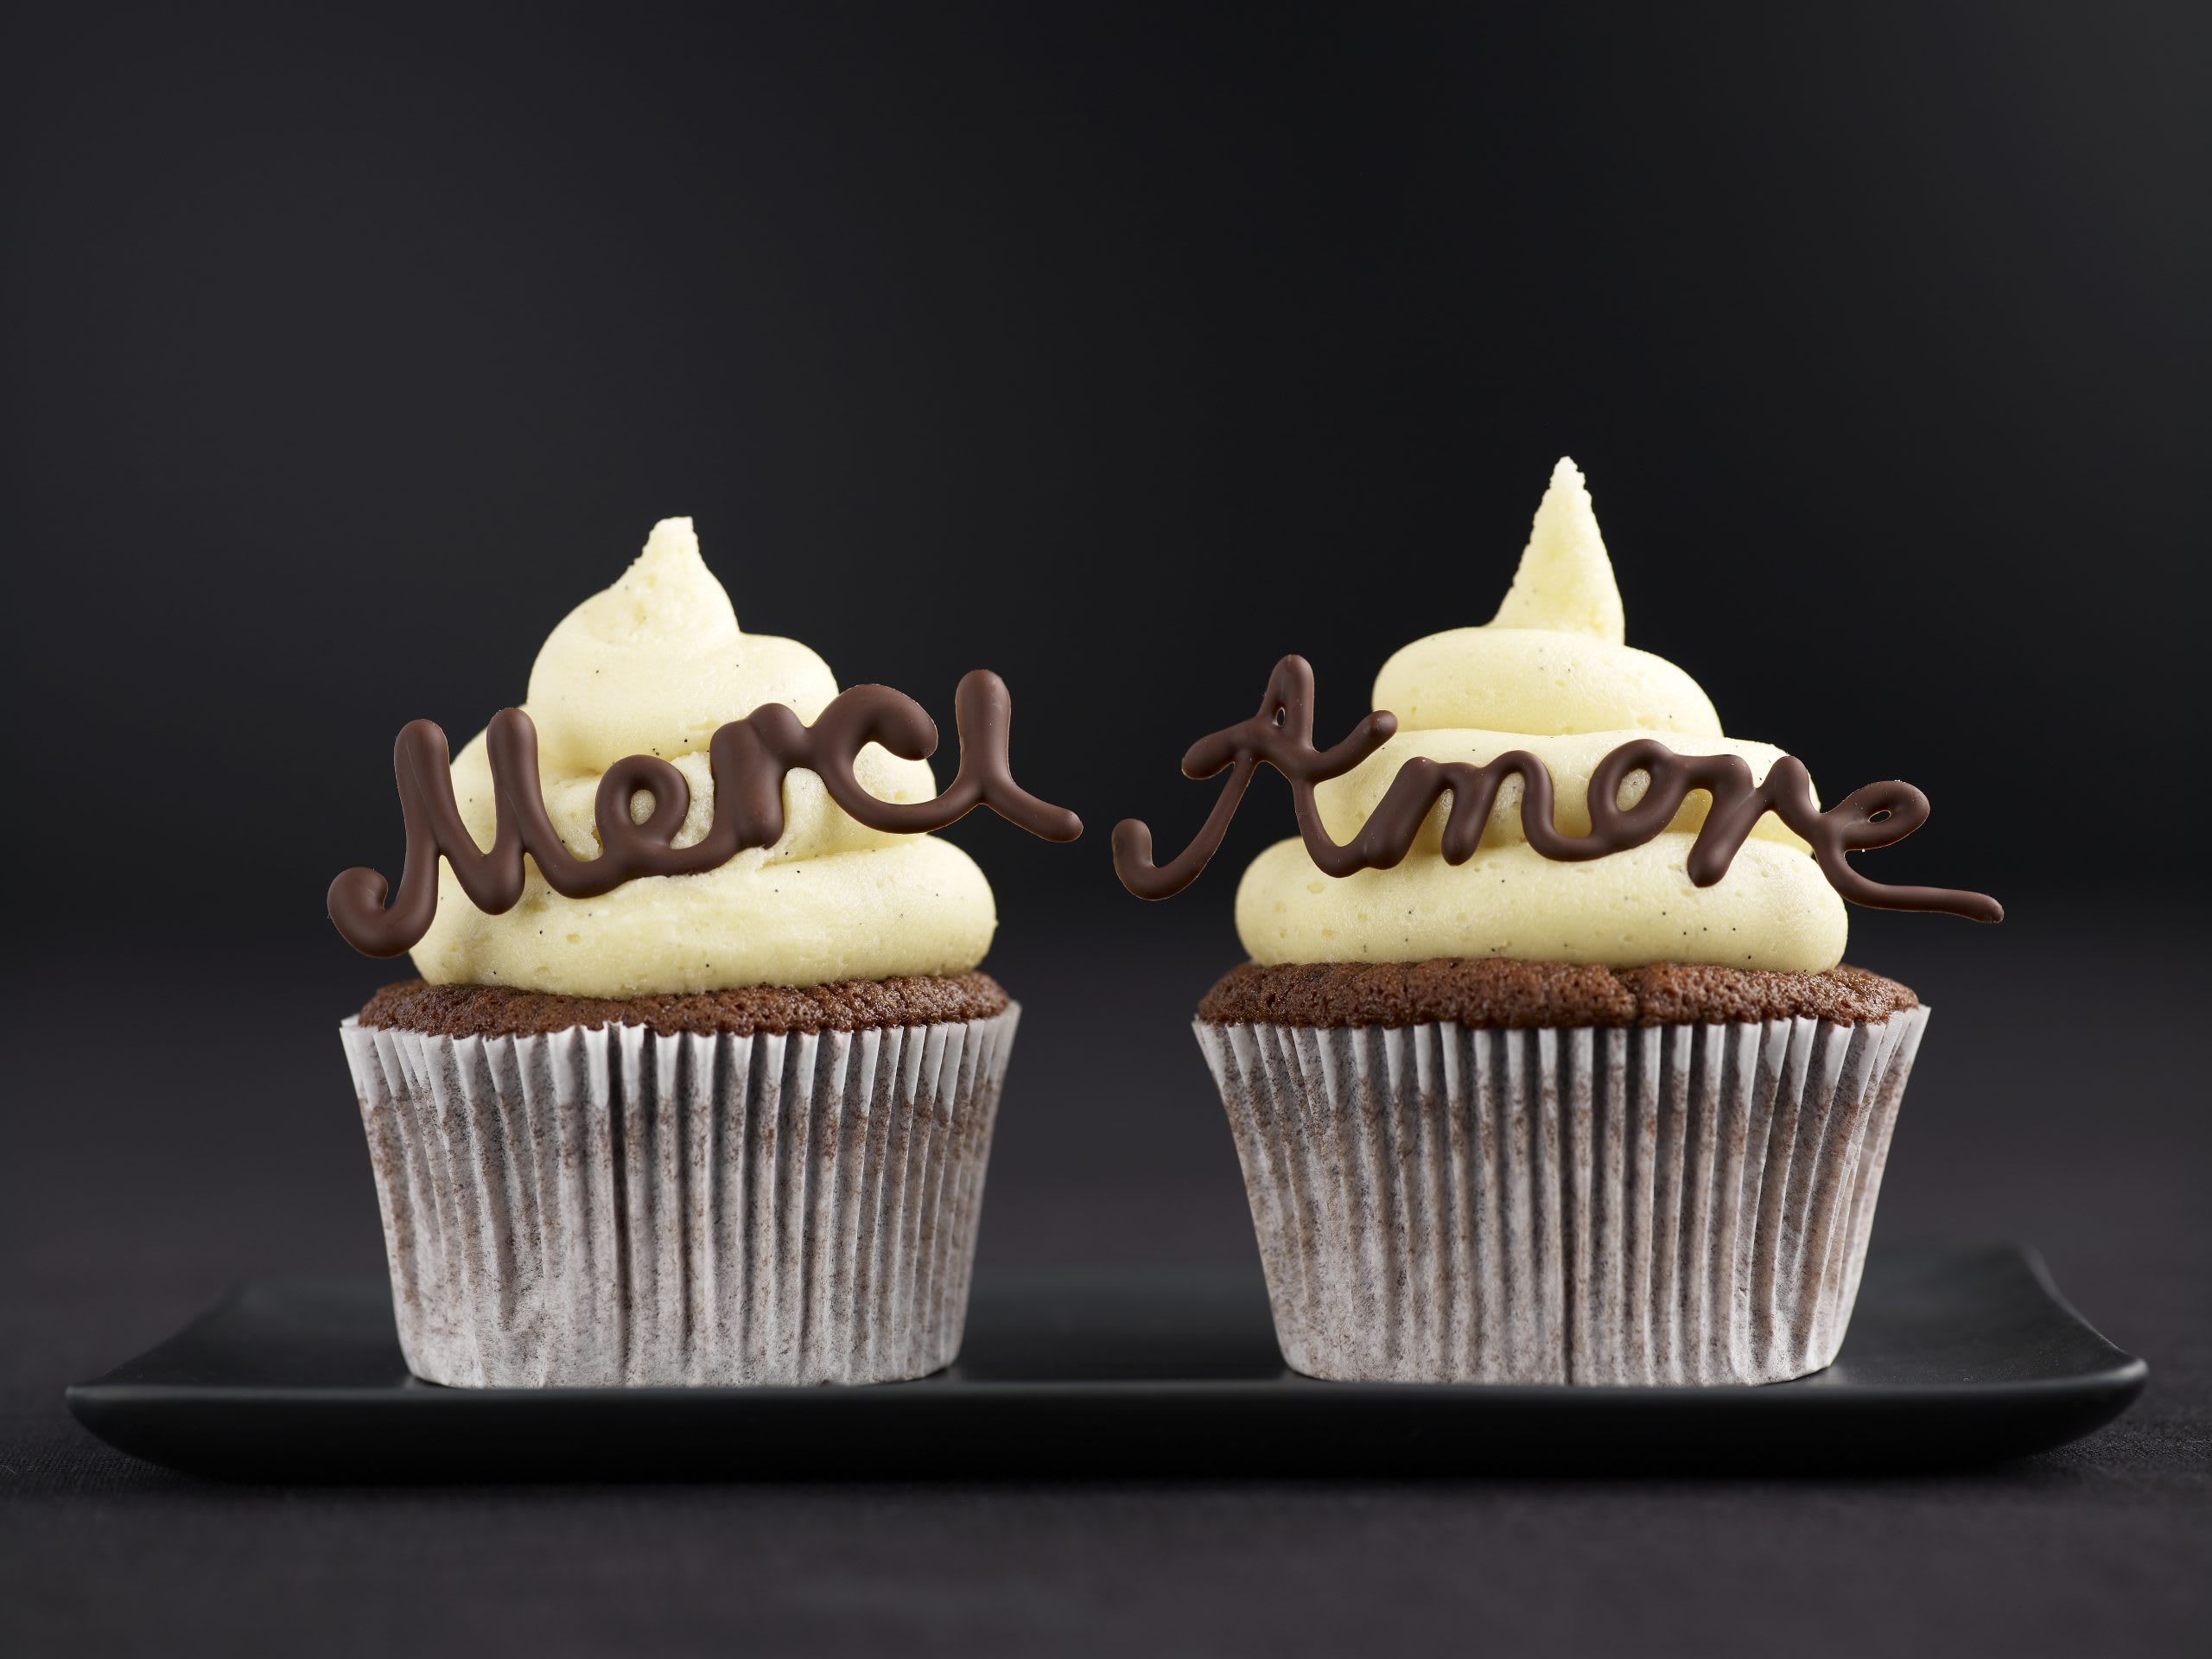 Cupcake Merci & Amore